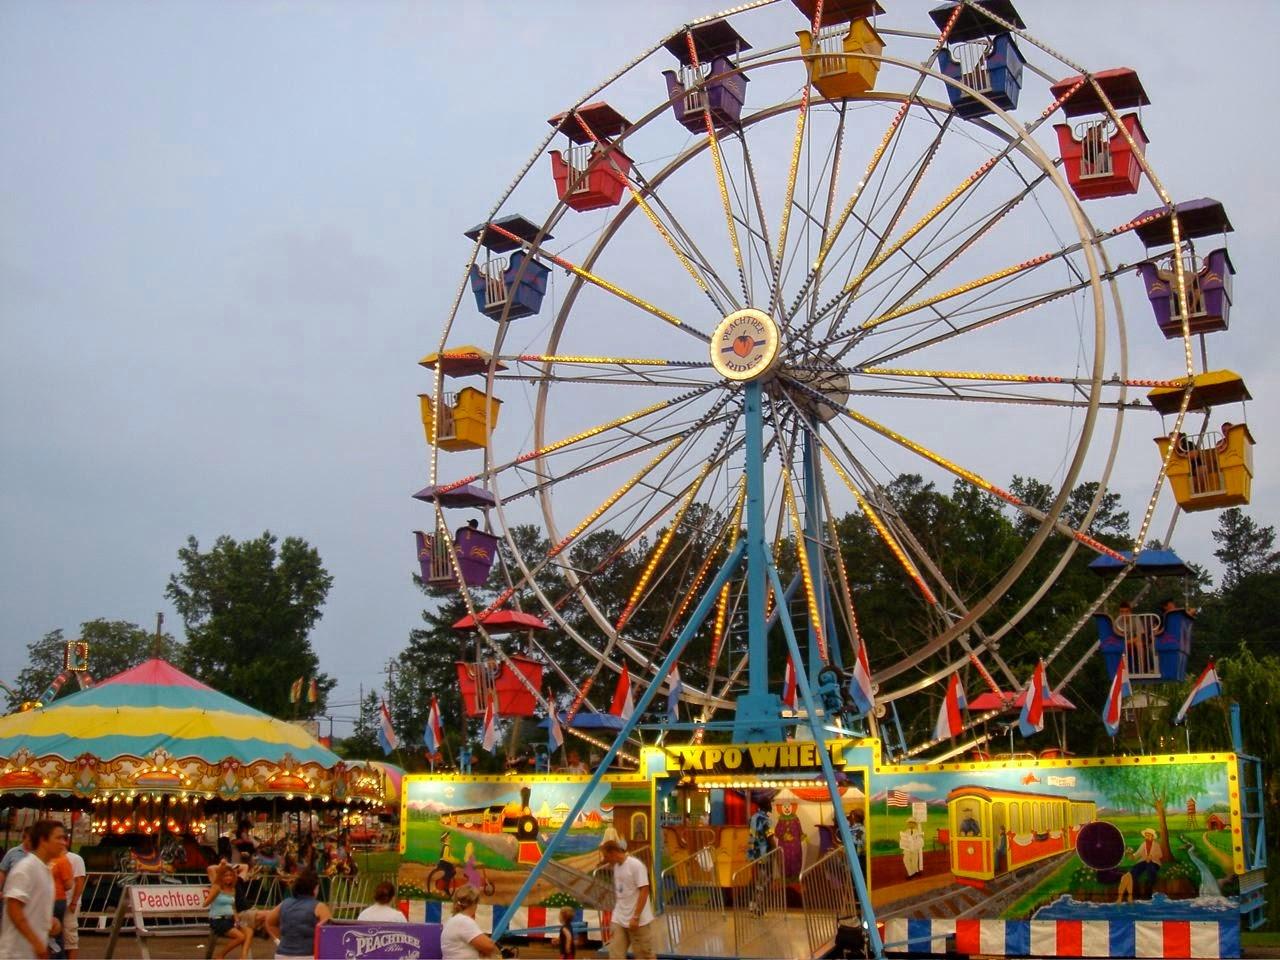 Shenandoah Shows knex carnival rides ™: ferris wheel variants